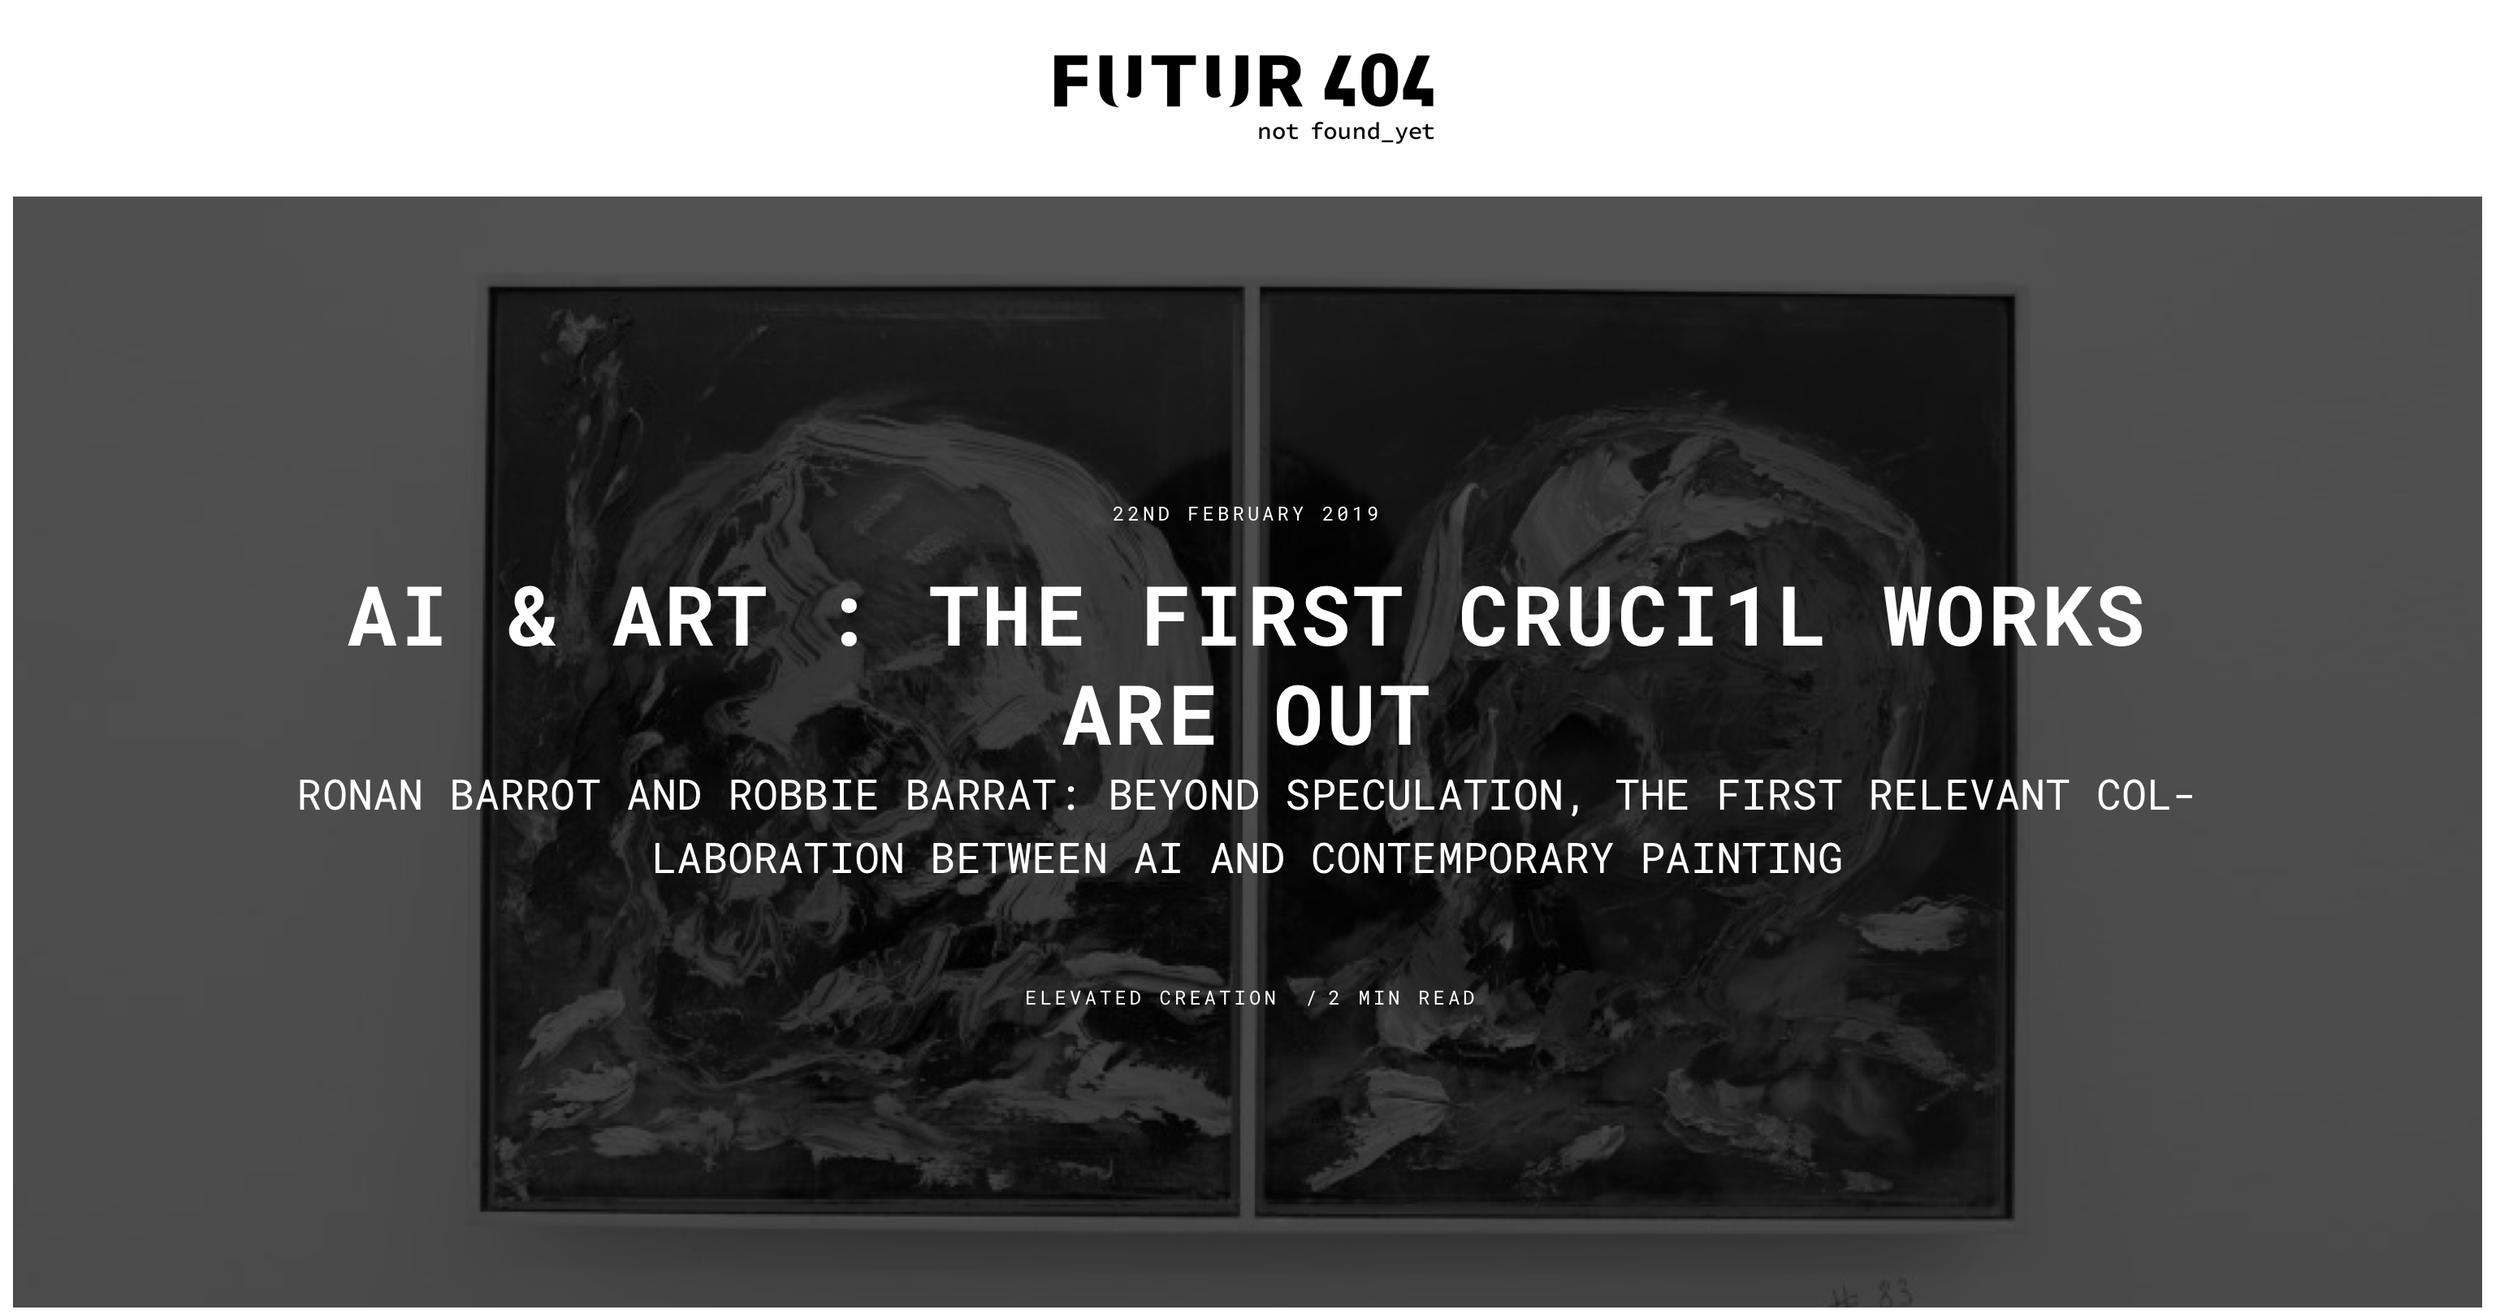 futur404.png